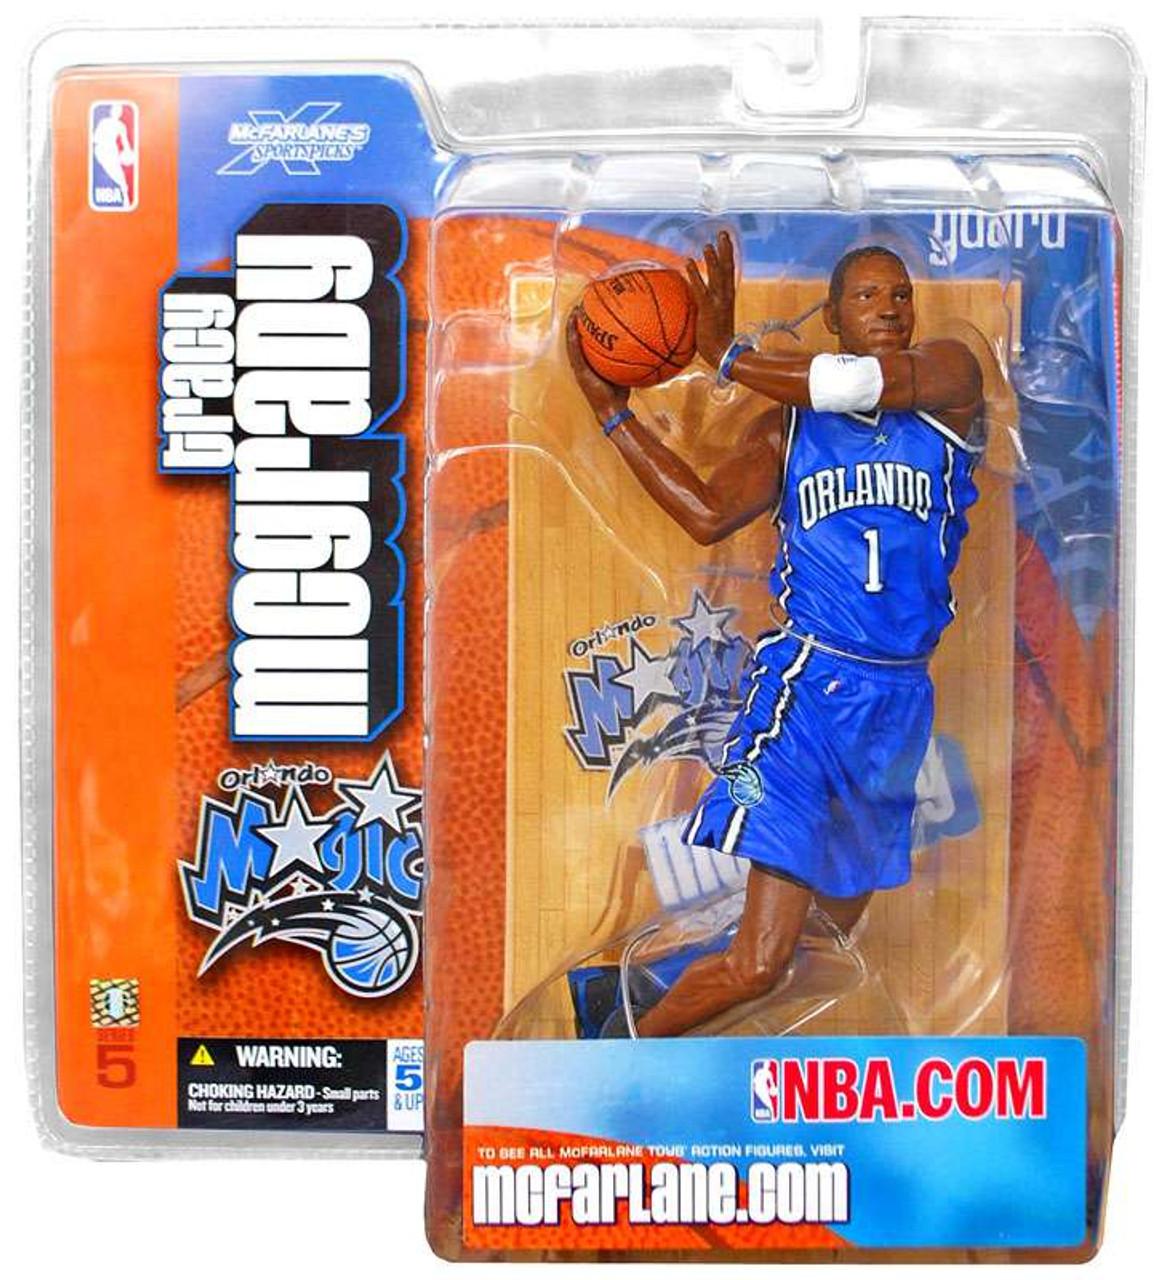 McFarlane Toys NBA Orlando Magic Sports Picks Series 5 Tracy McGrady Action Figure [Blue Jersey]